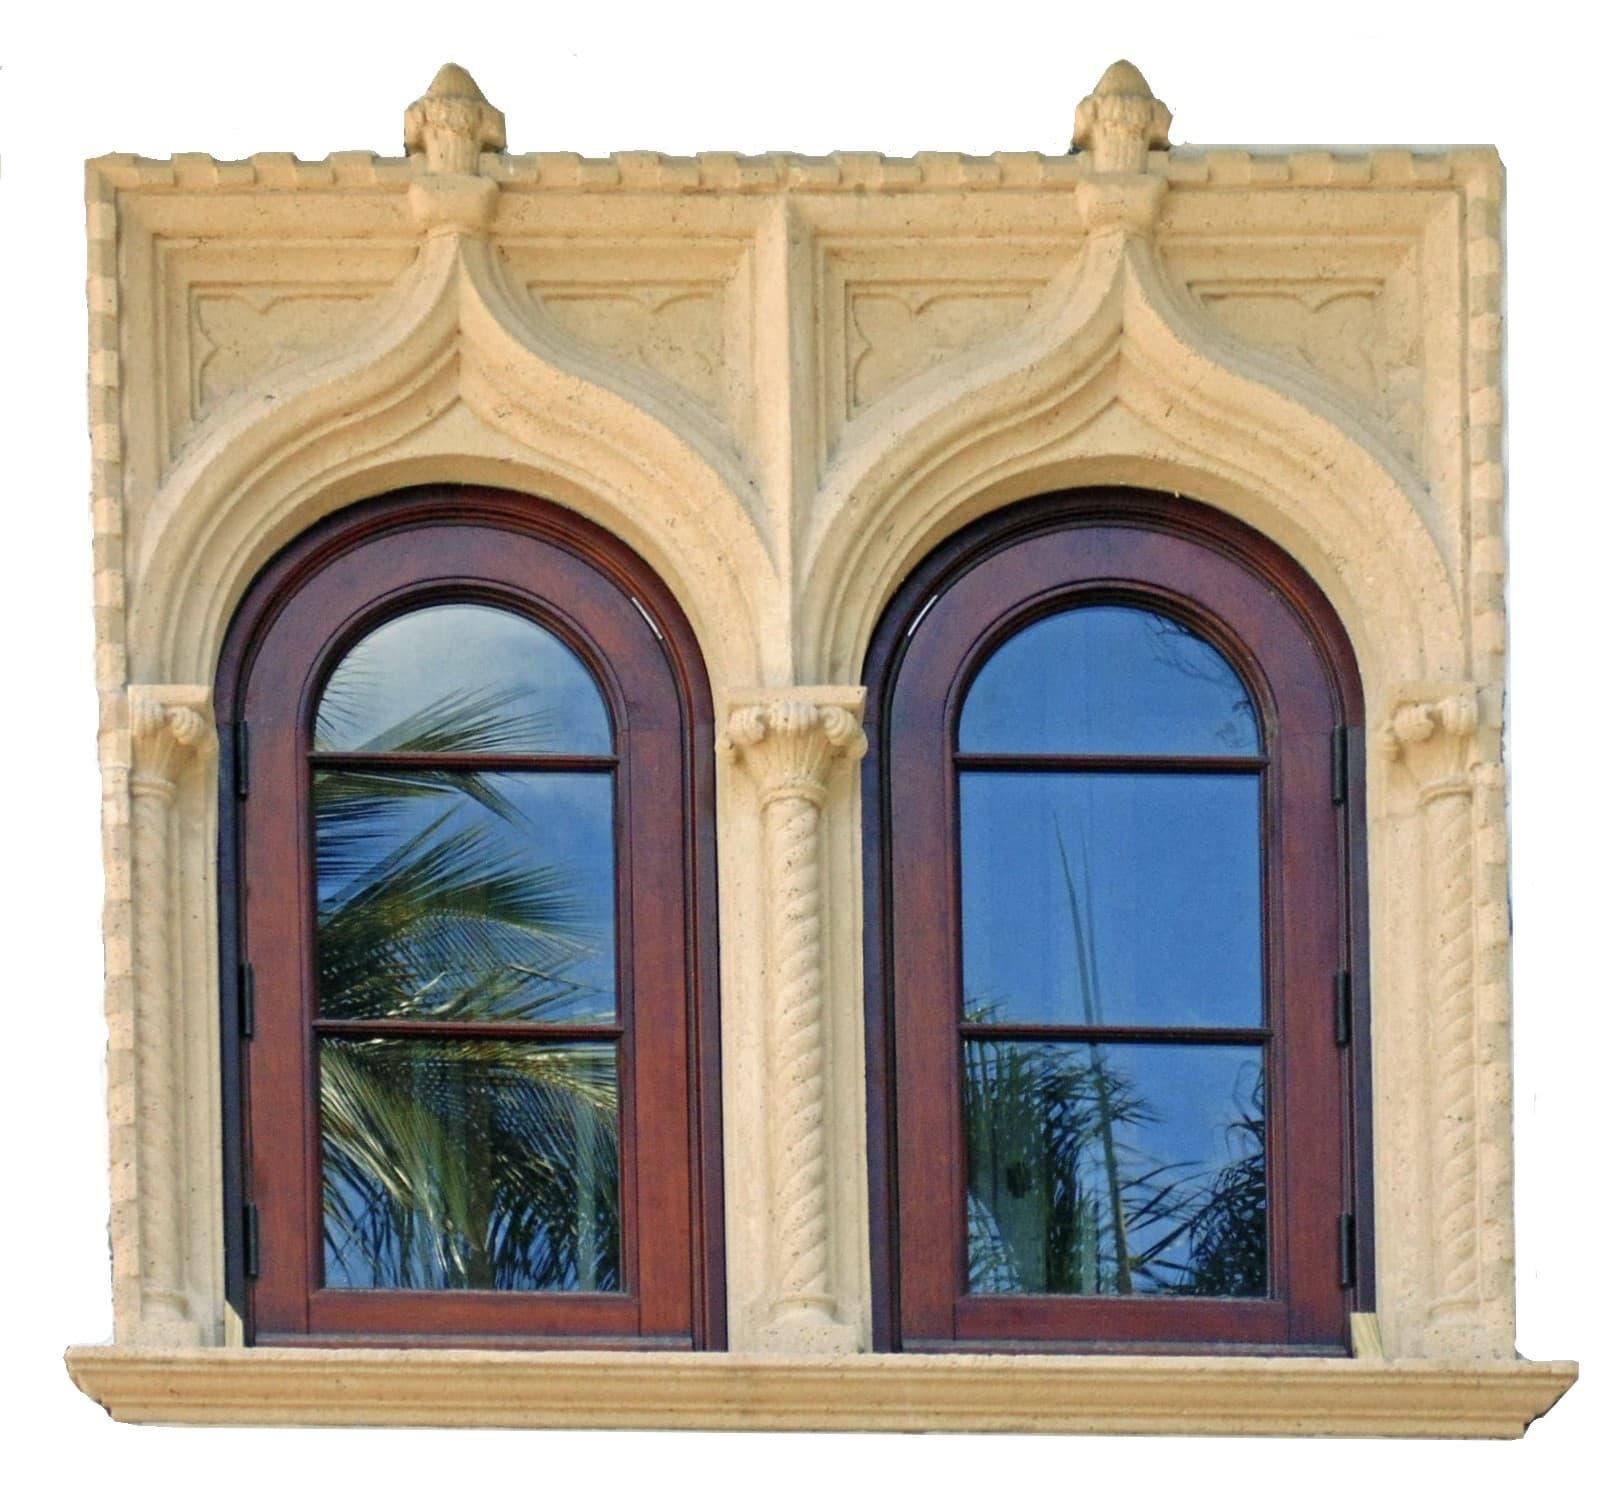 PALM ISLAND MAHOGANY ARCHED WINDOWS